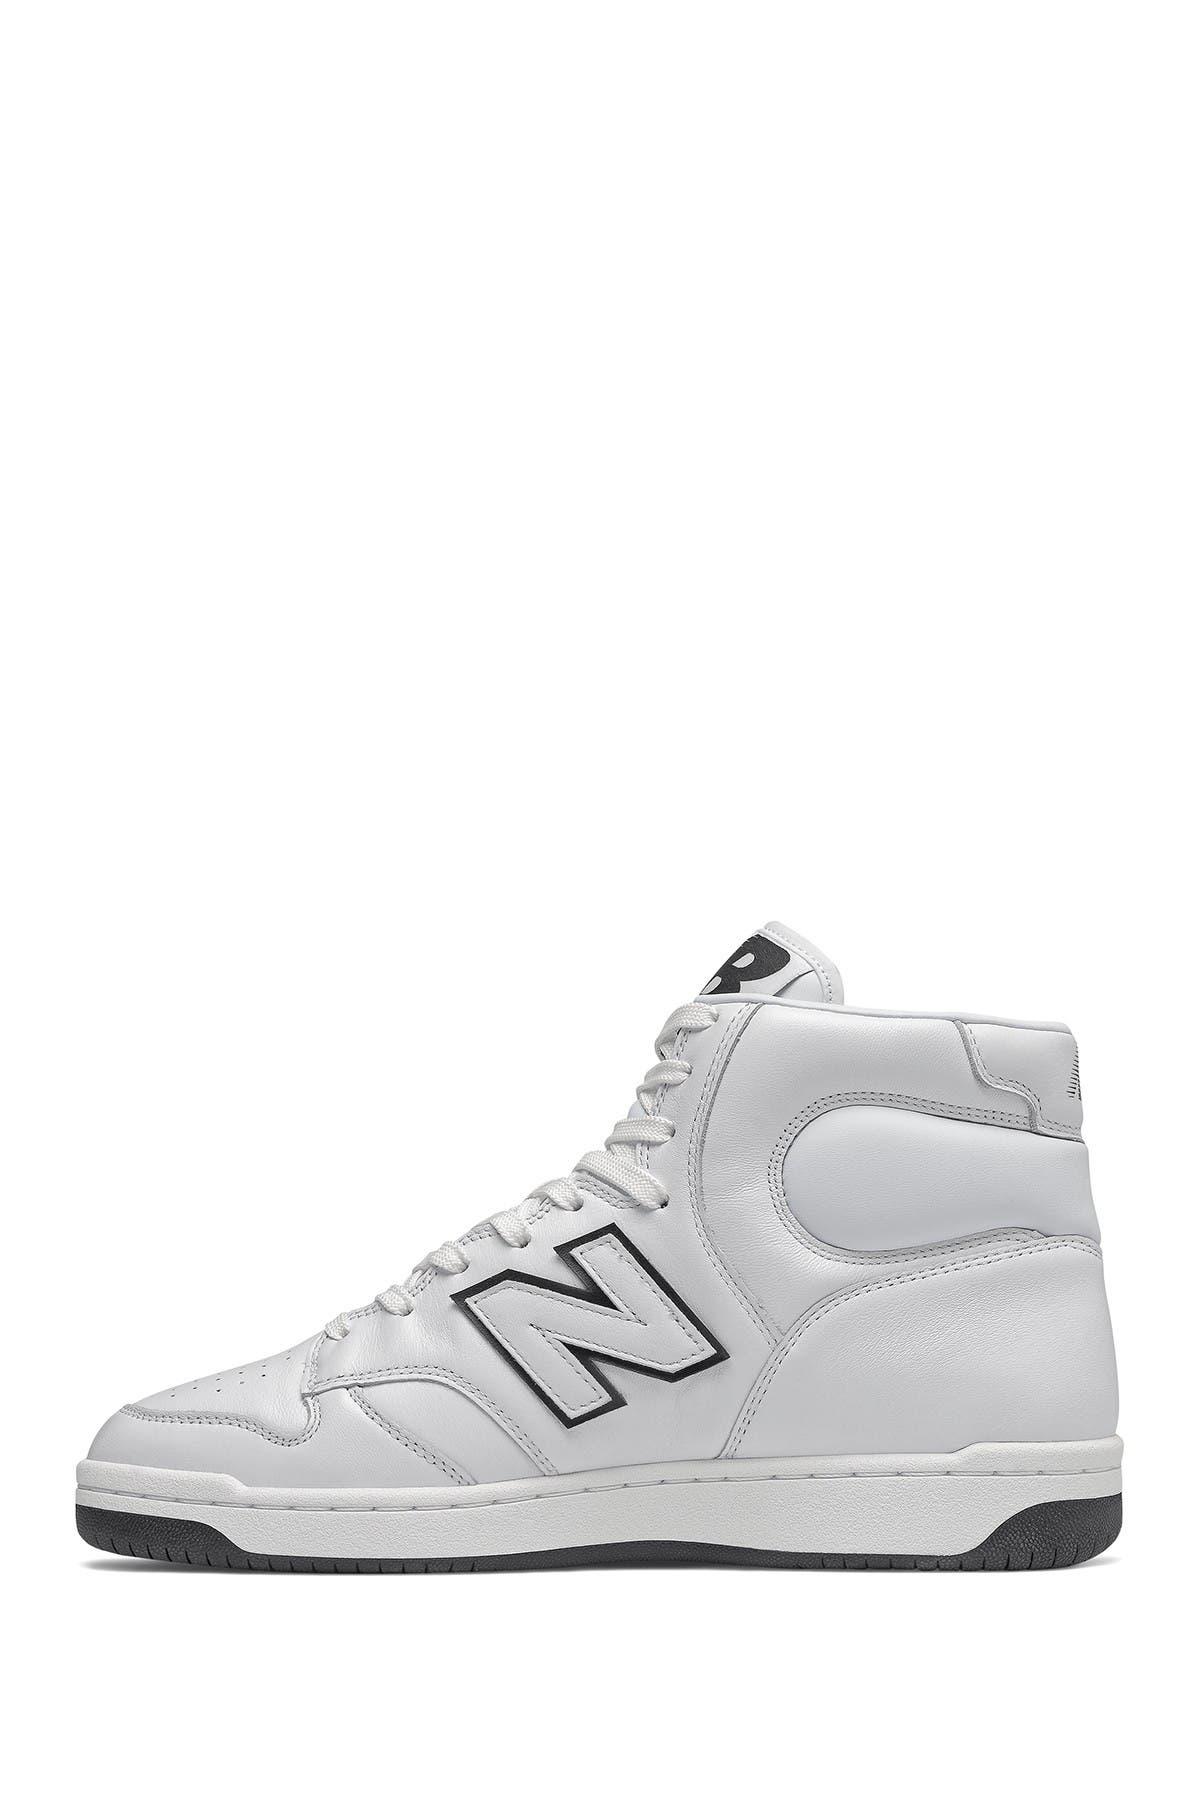 New Balance   480 High Top Sneaker   Nordstrom Rack